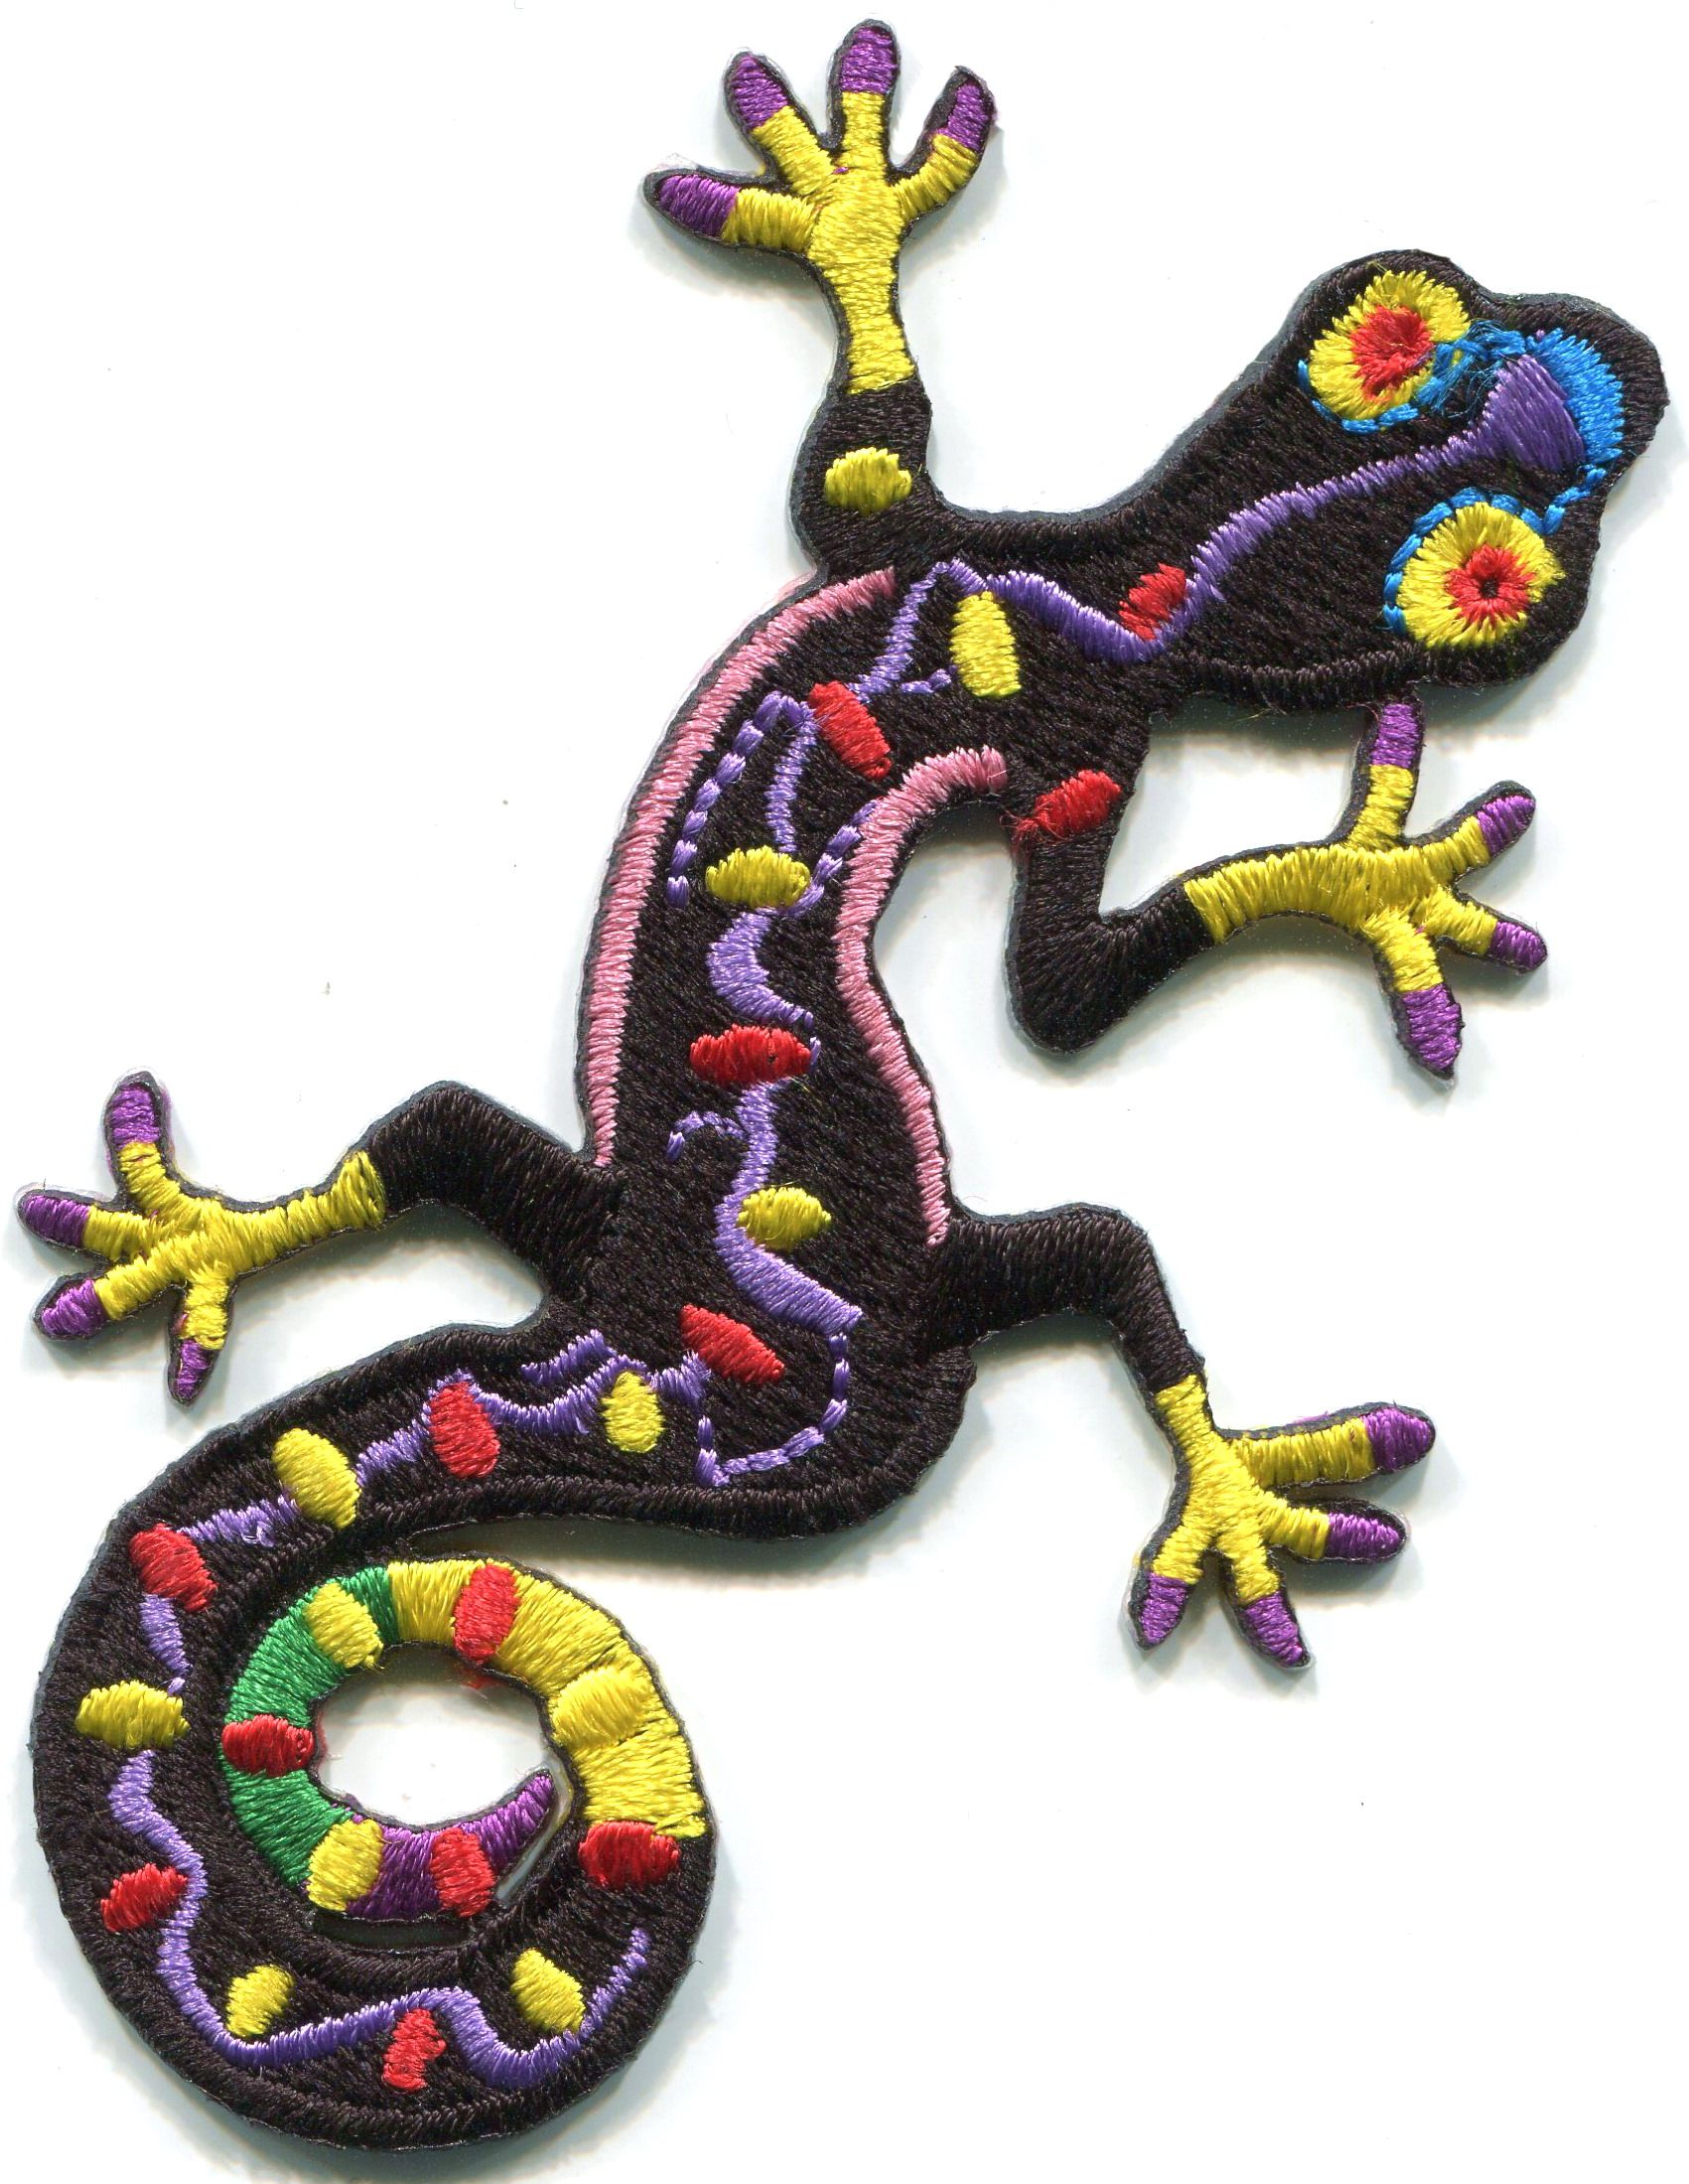 Iron-On Patch Salamander Lizard